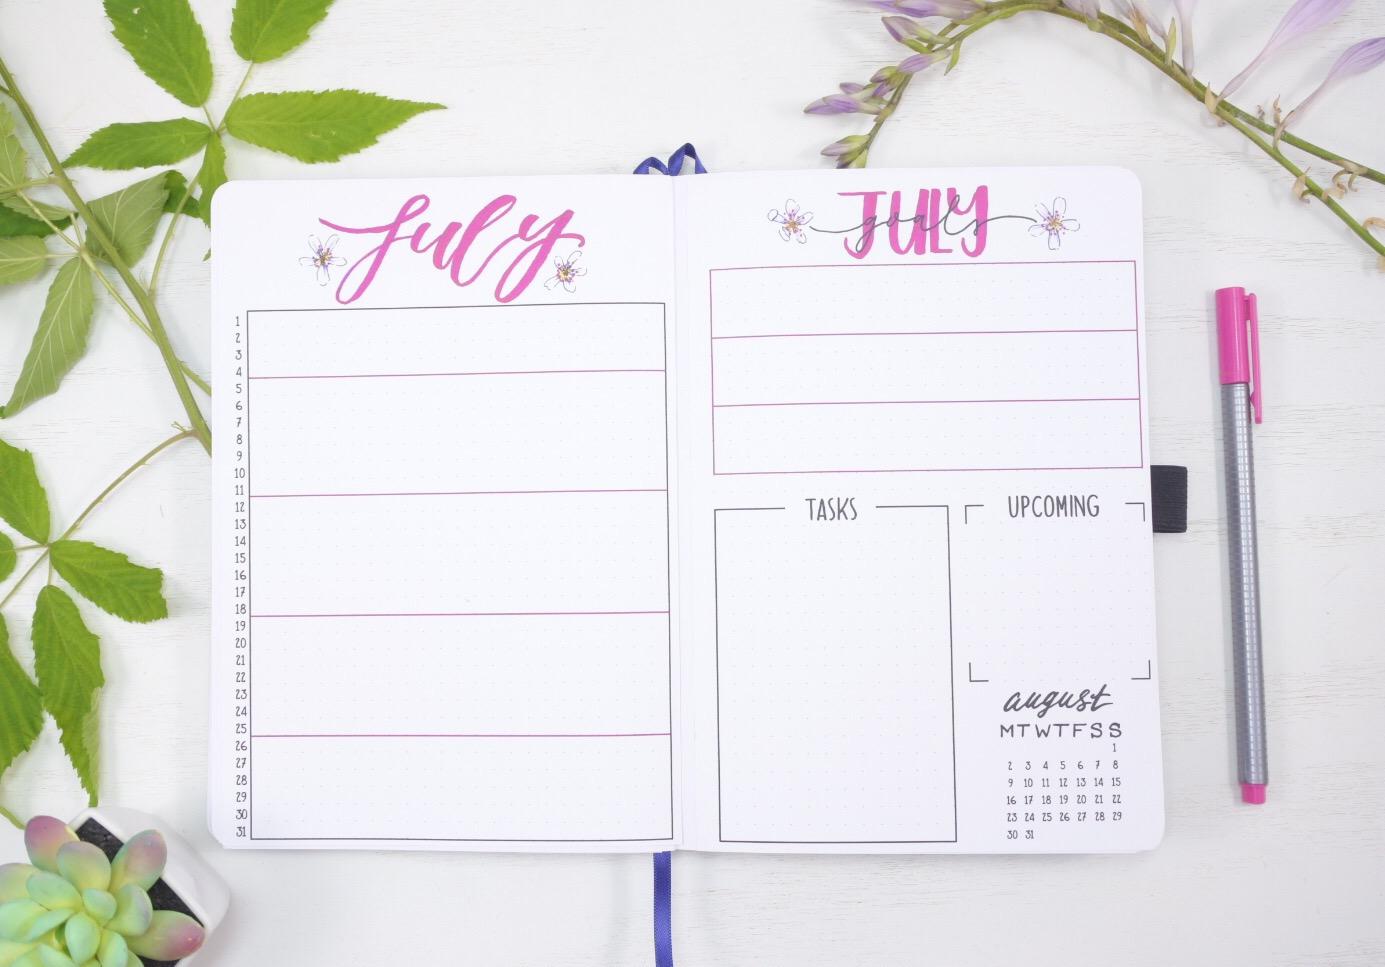 July 2021 Bullet Journal Calendar and Tasks Spread